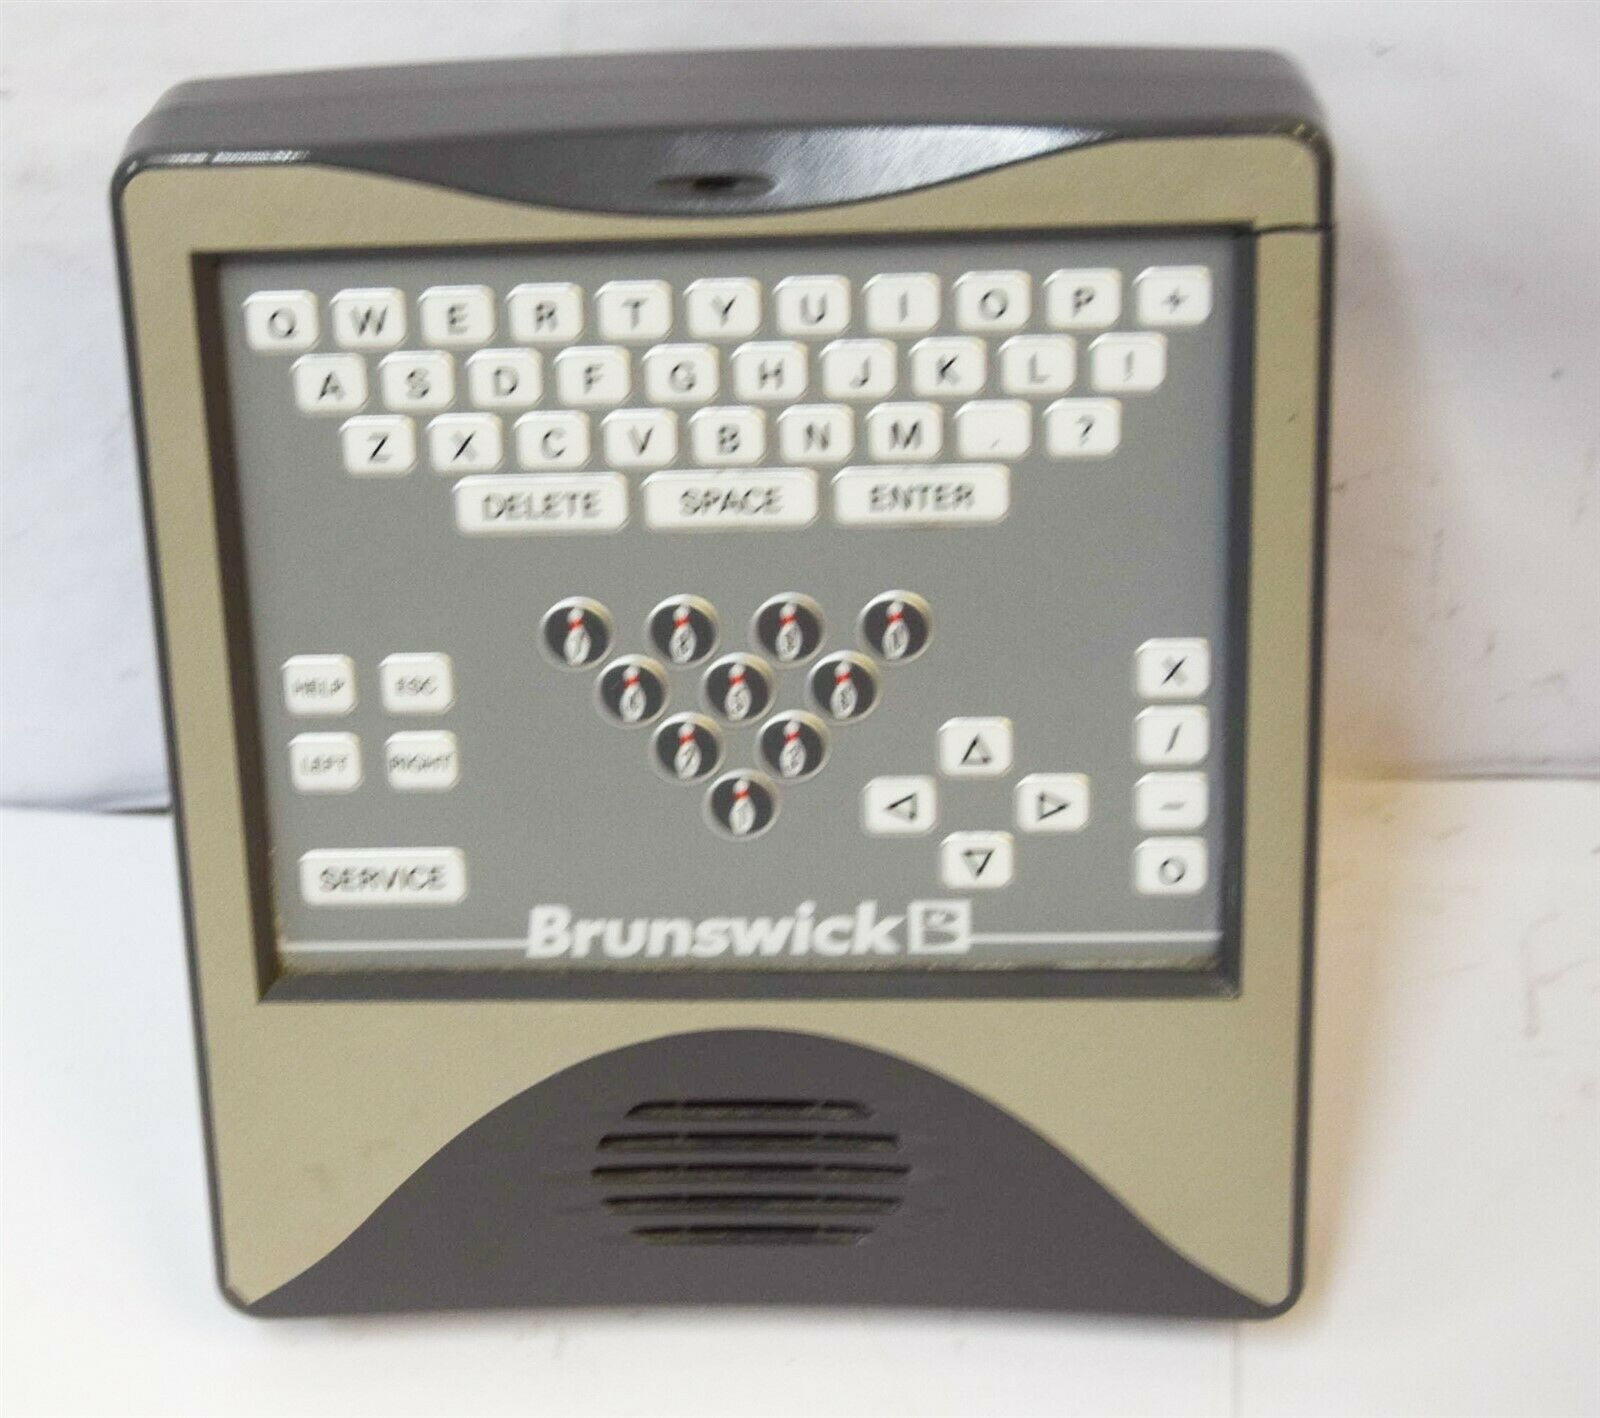 Brunswick Bowling Alley Control Panel Scorer